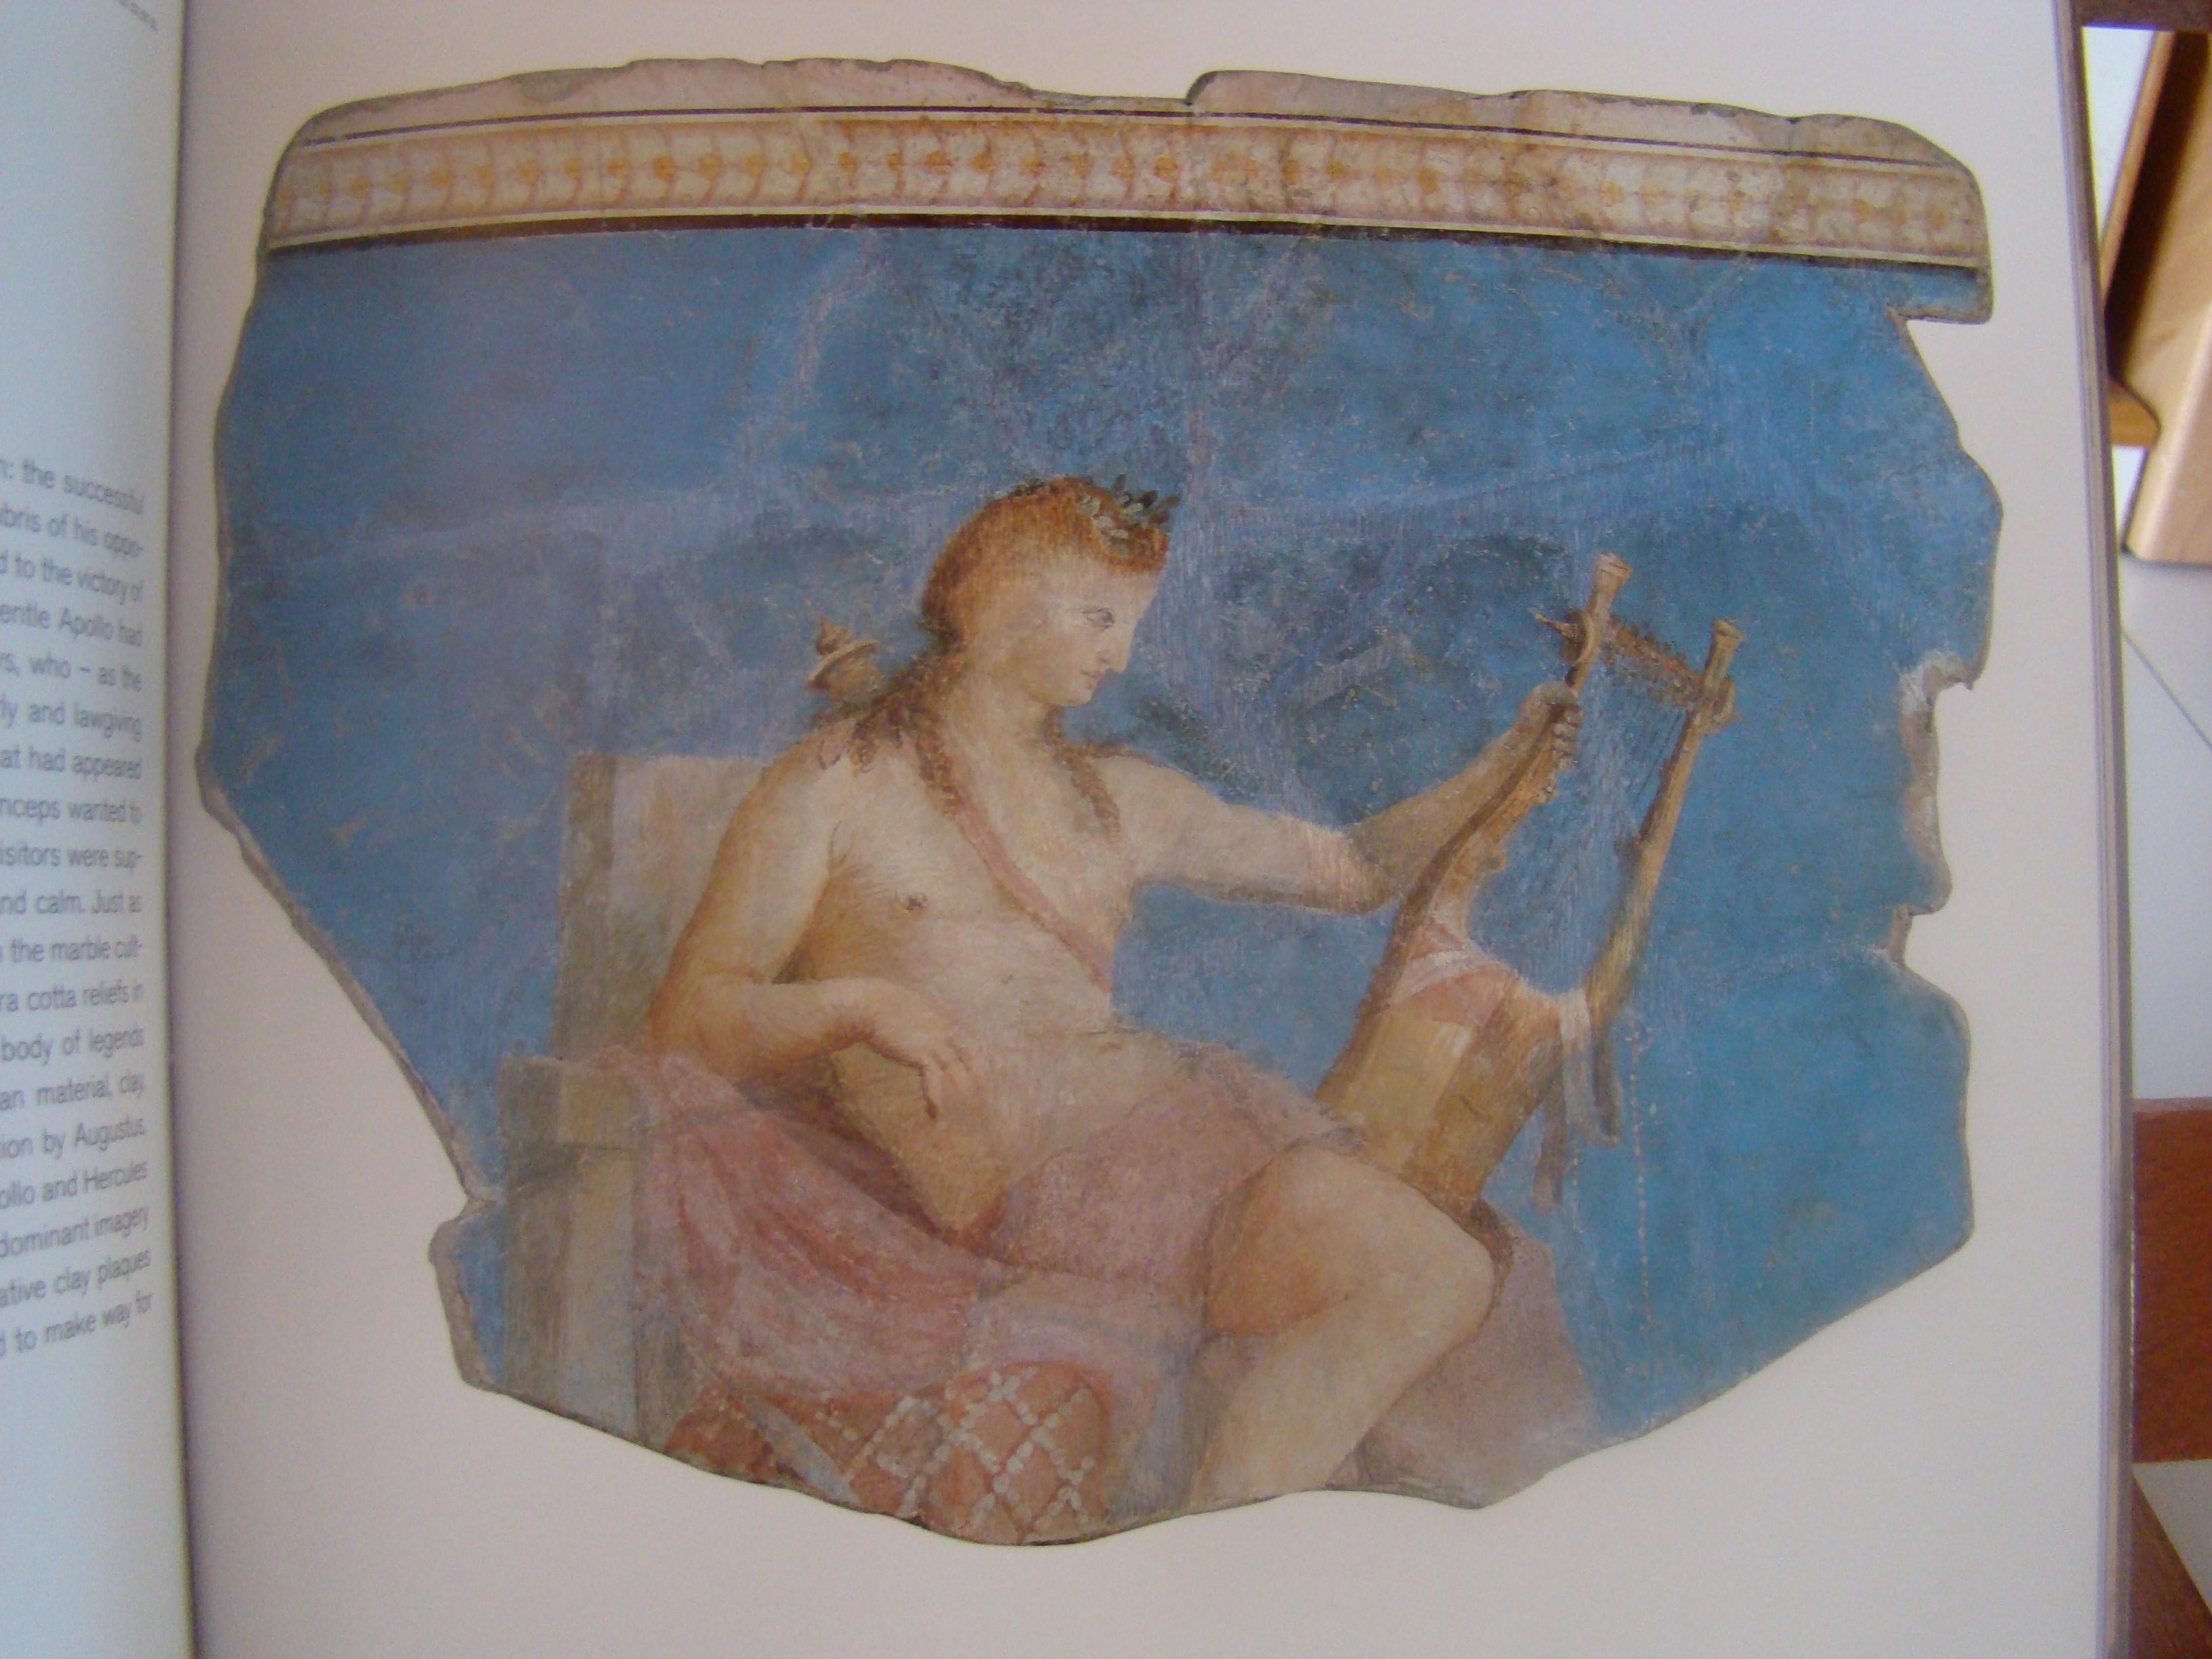 Slika 6: Apolon z liro ali kitharo Fragment freske, Rim, ok. 28 pr. n. št.